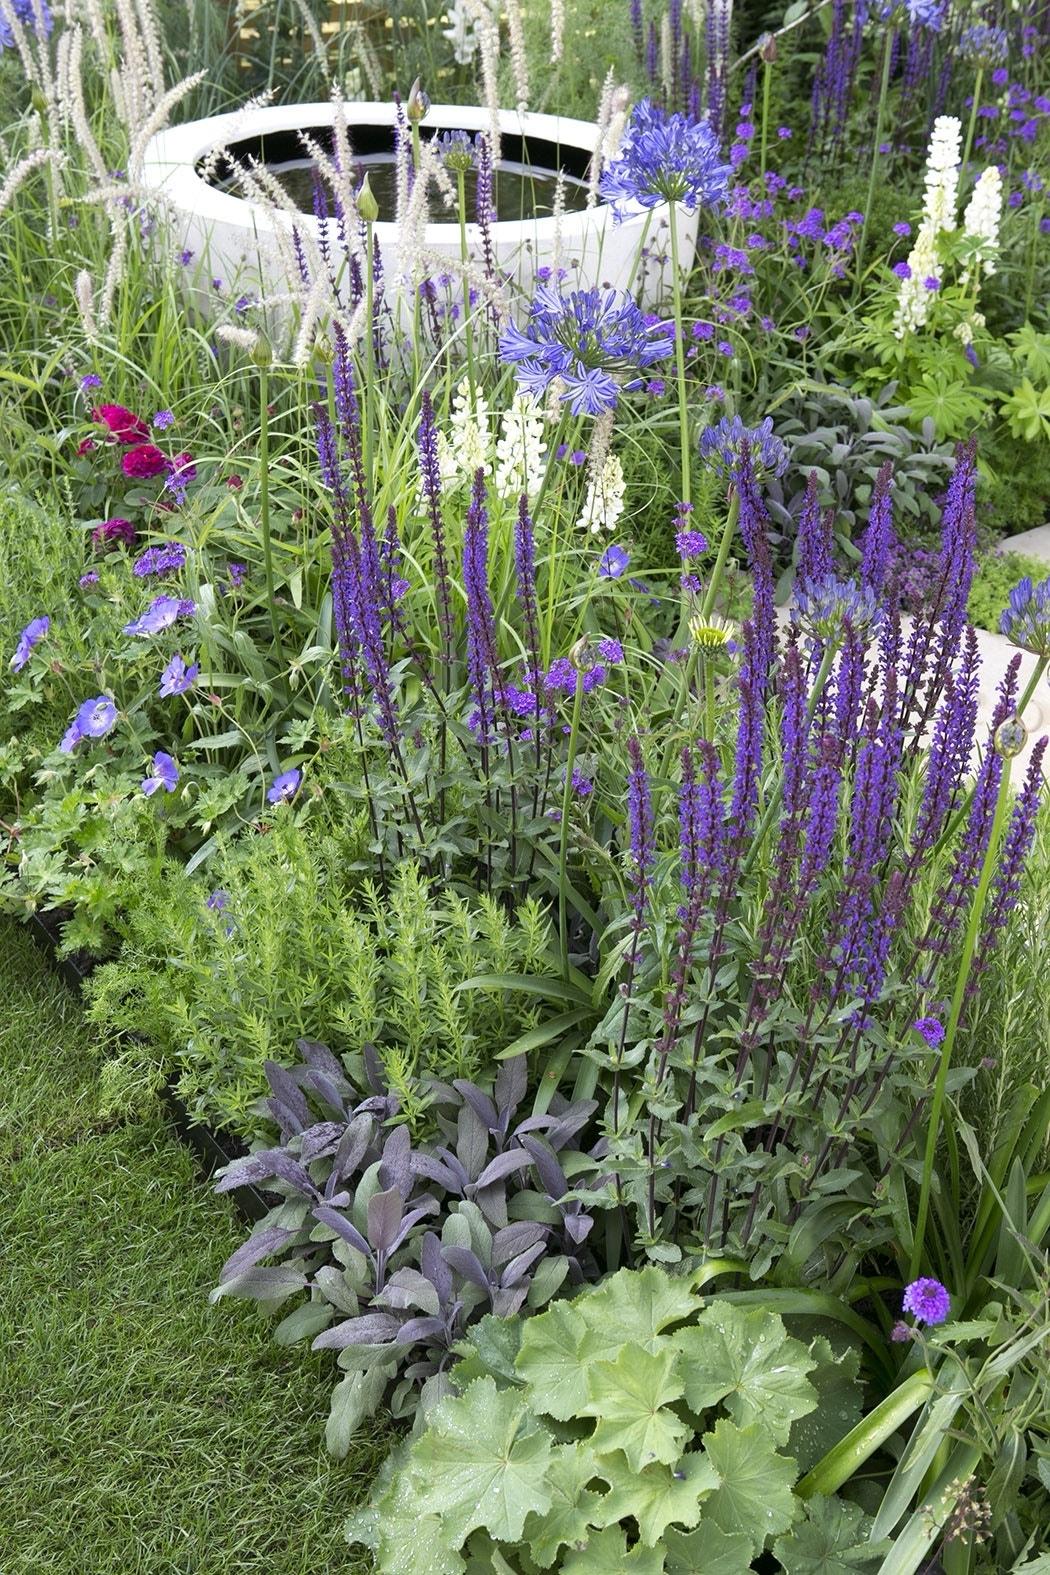 Borderpakket Smalle border in paars-Plant in pot-Per 2 m². Kleur: paars